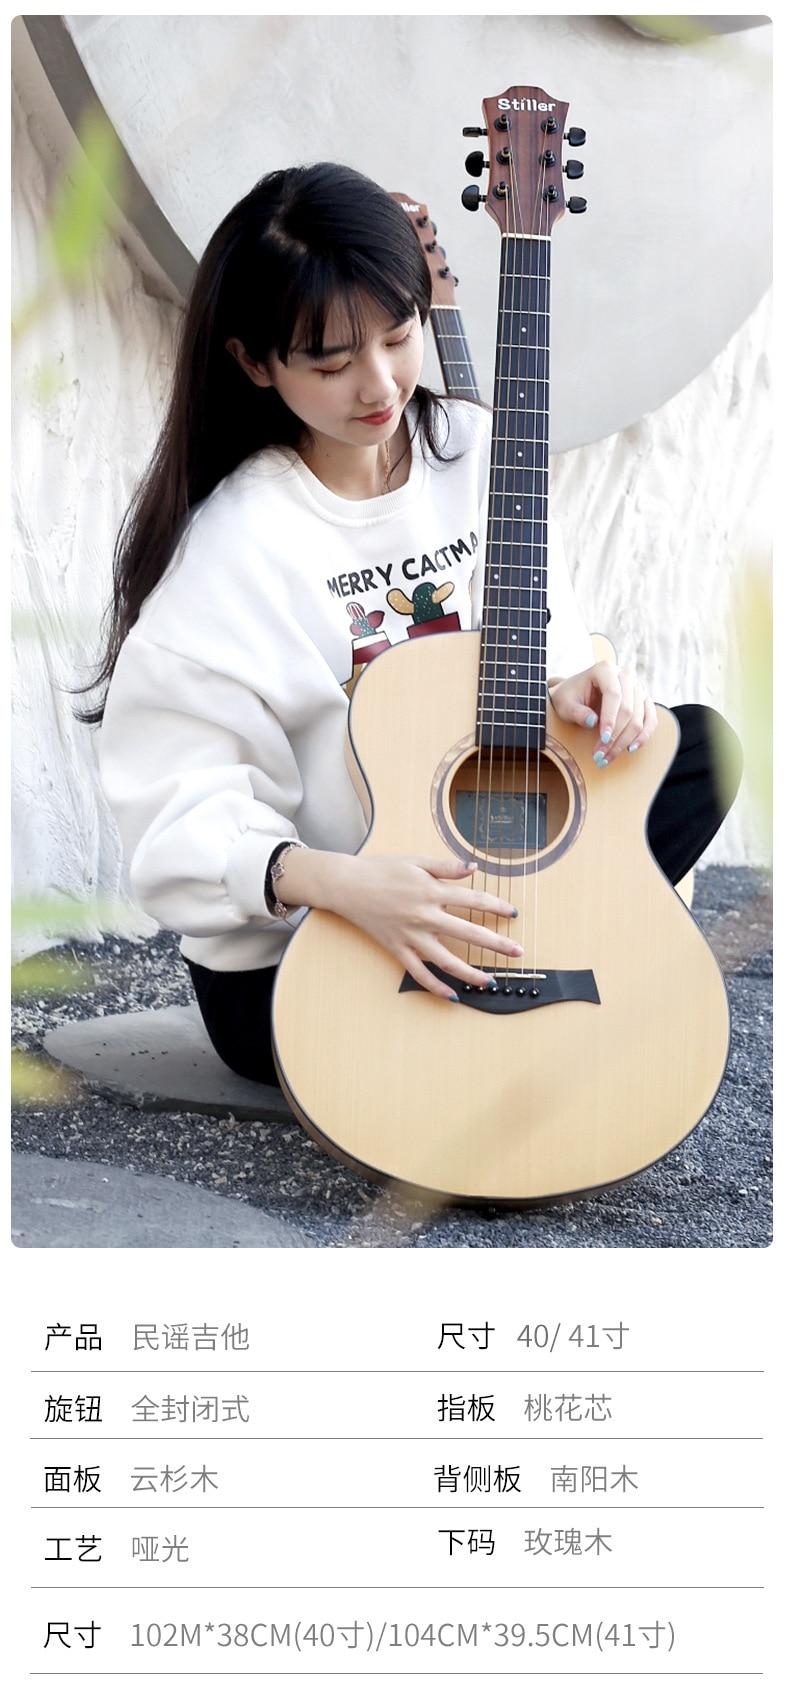 41 Inch Guitar Body All Solid Wood Passive Closed Type Hollow Tenor Guitar Picea Asperata Chitarra Classica Entertainment EH50G enlarge